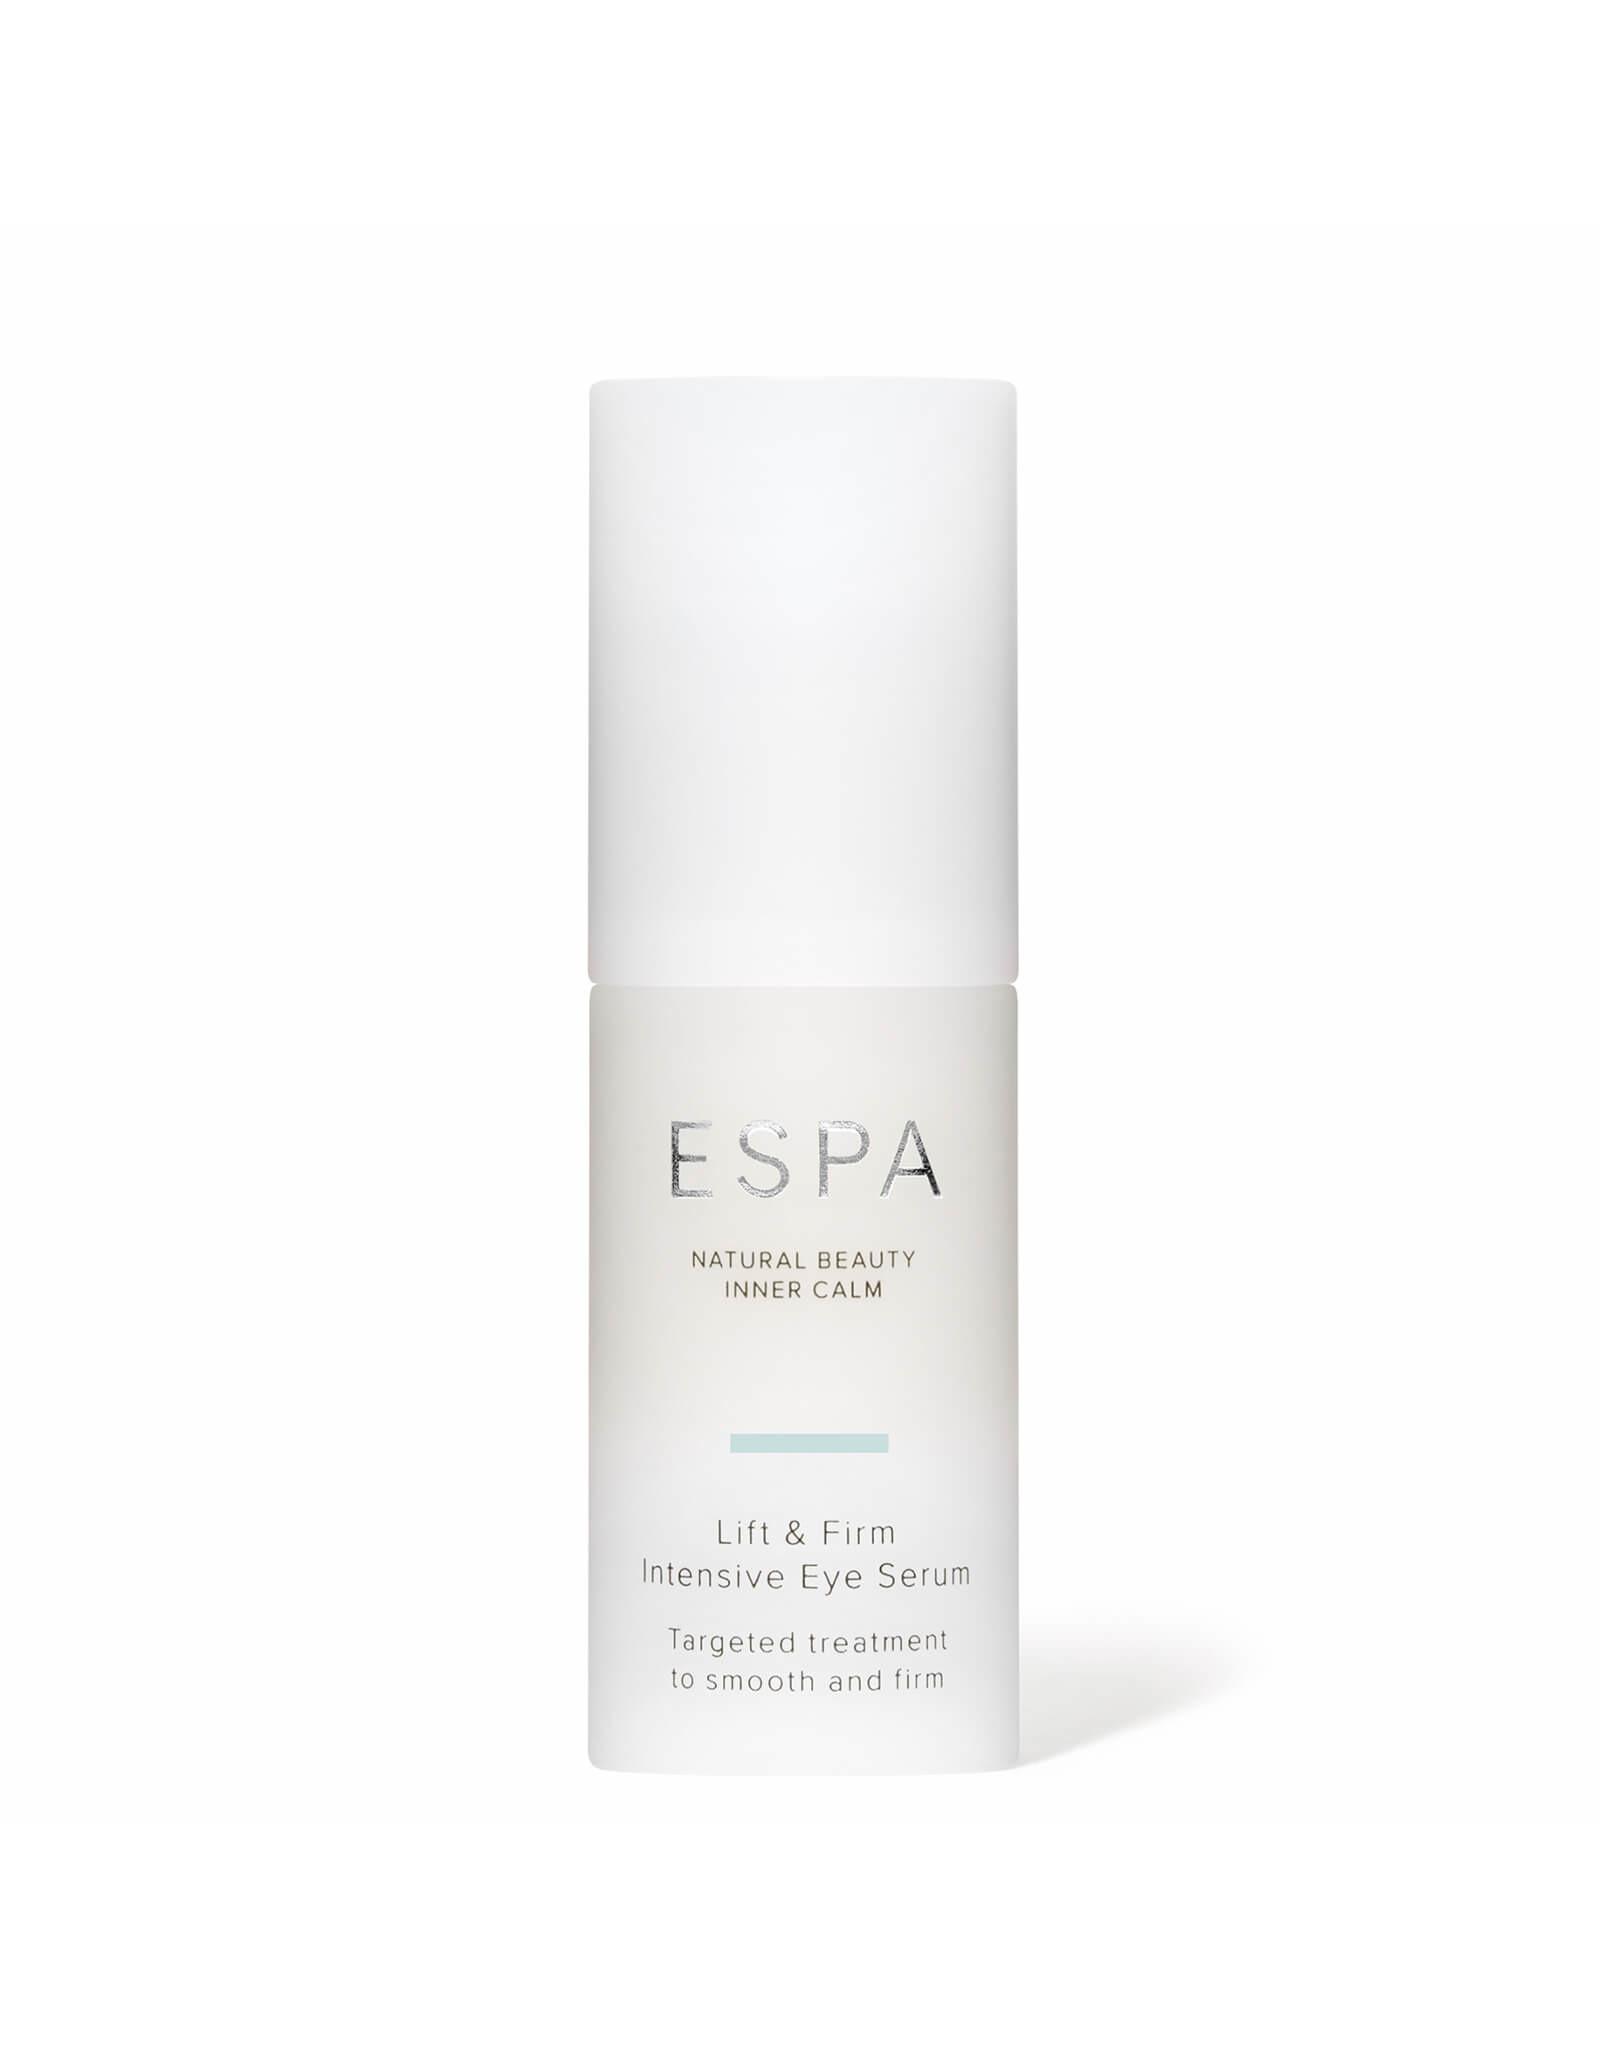 ESPA Lift & Firm Eye Serum, 15ml